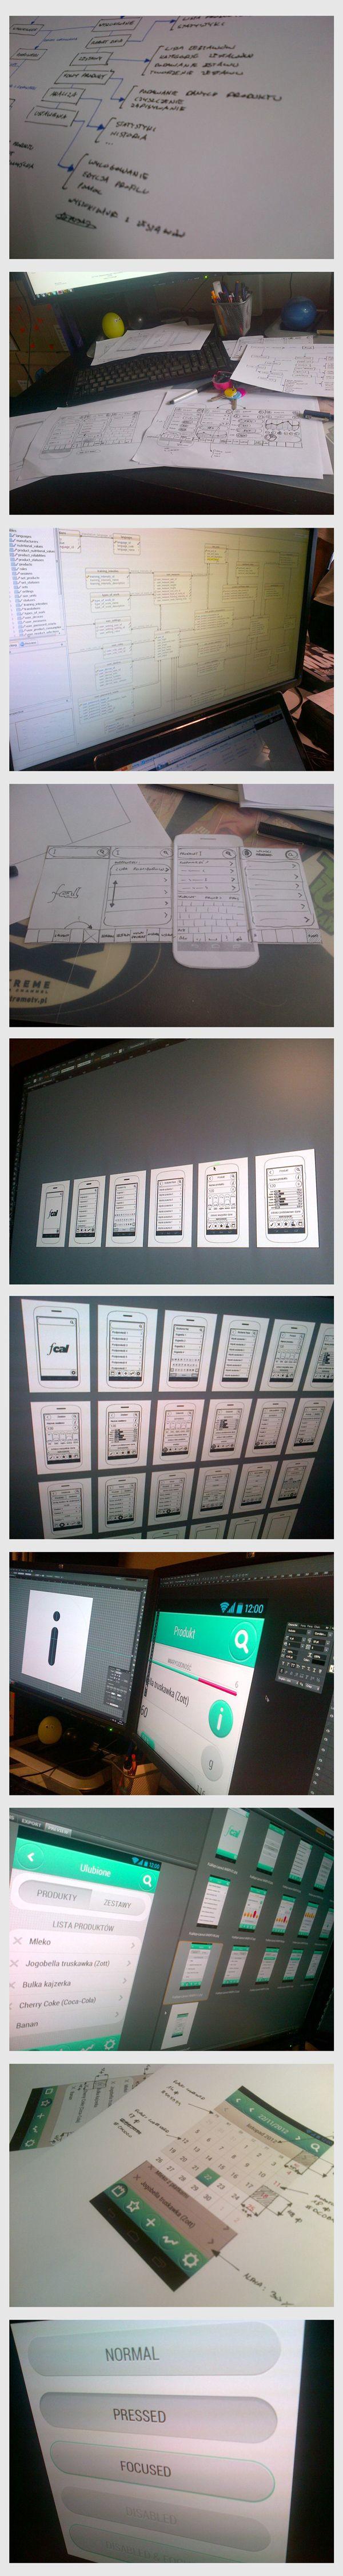 nice! - fcal - mobile app design process    ----BTW, Please Visit:  http://artcaffeine.imobileappsys.com